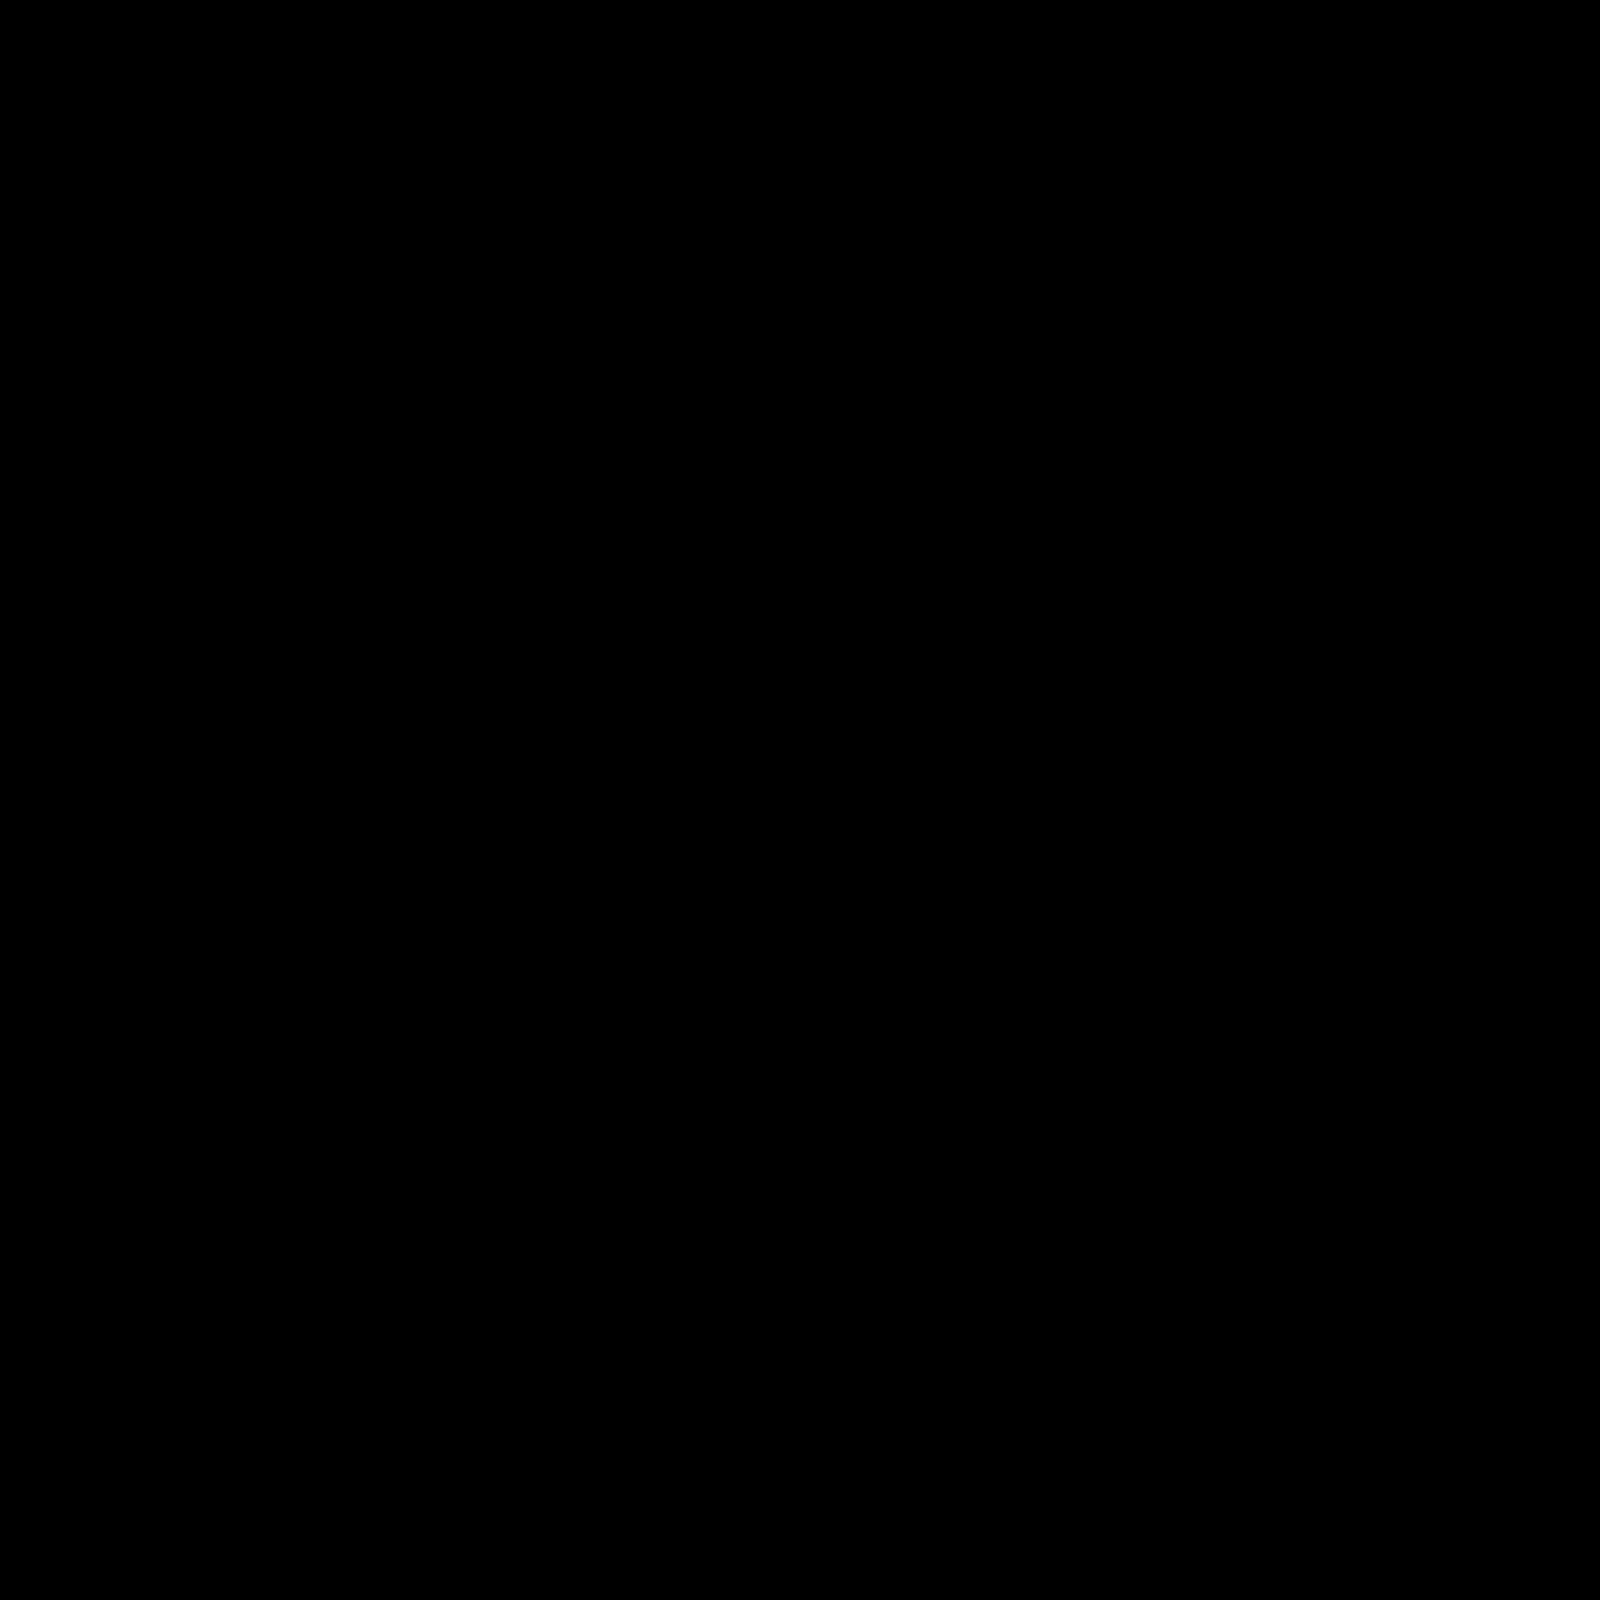 svg library Libra Icon